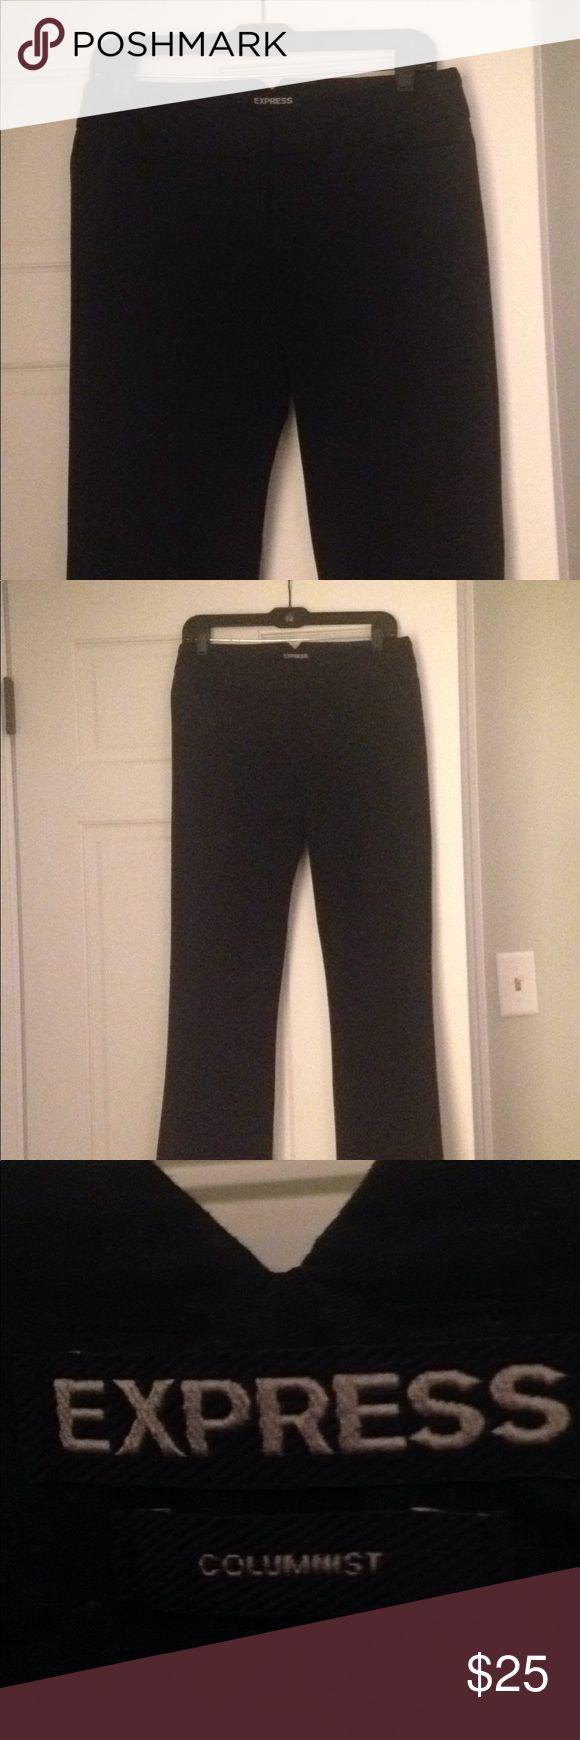 Express Columnist Pants Black size 6 Gently worn Express Columnist pants Express Pants Boot Cut & Flare